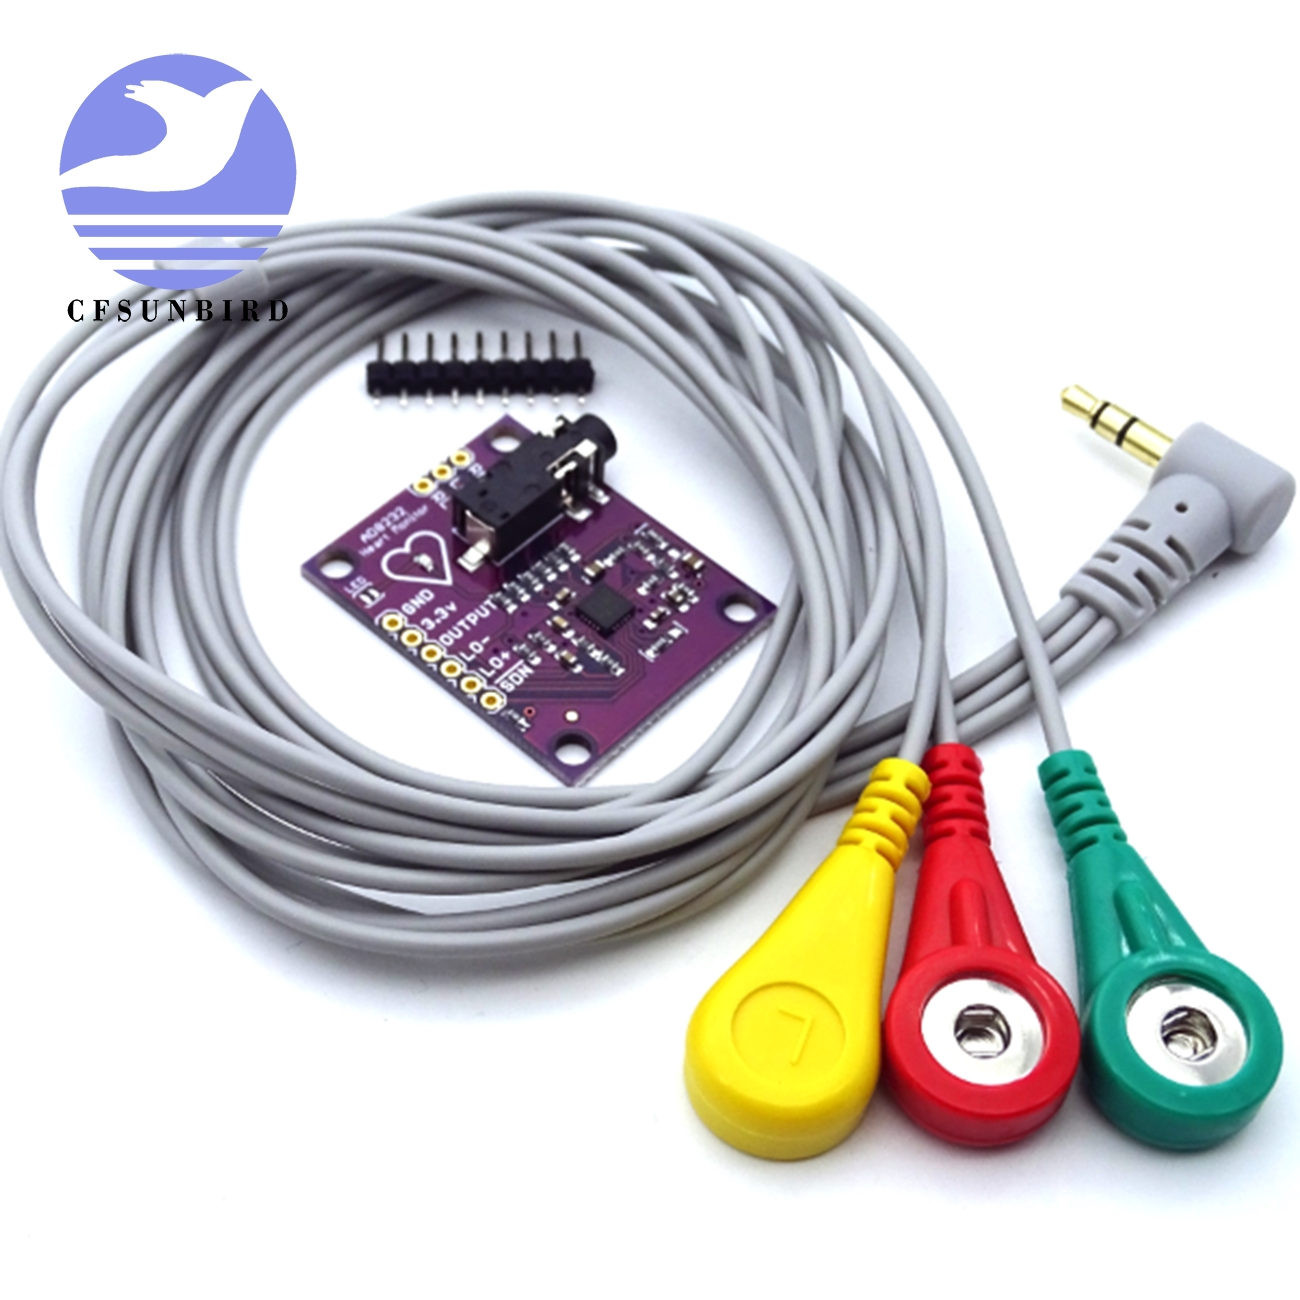 8232 AD8232 Cardiac Electrophysiology Measuring The Pulse Of The Heart ECG Monitoring Sensor Module Kit